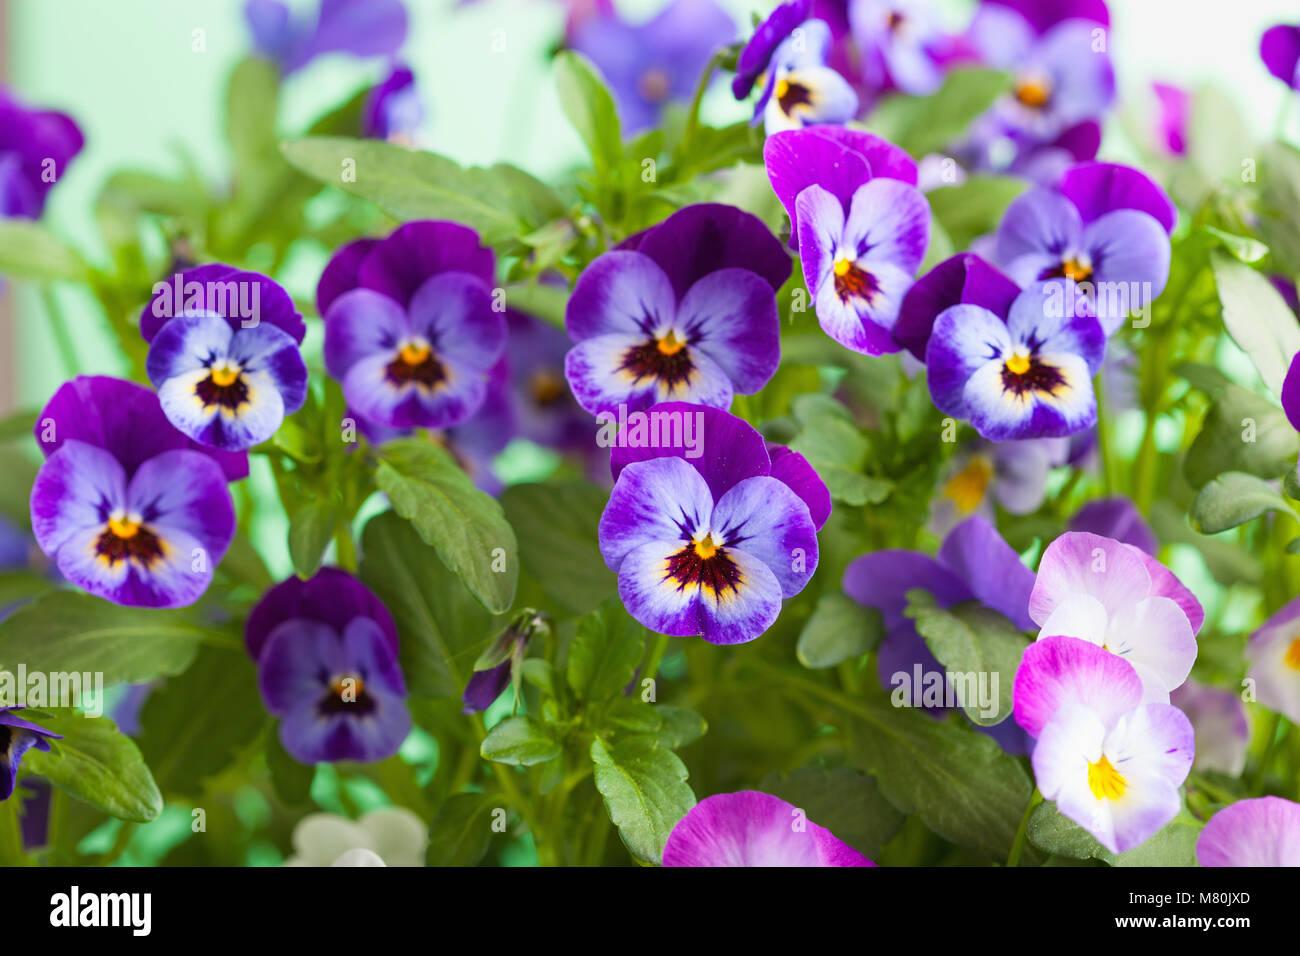 Beautiful pansy summer flowers in garden stock photo 177035781 alamy beautiful pansy summer flowers in garden izmirmasajfo